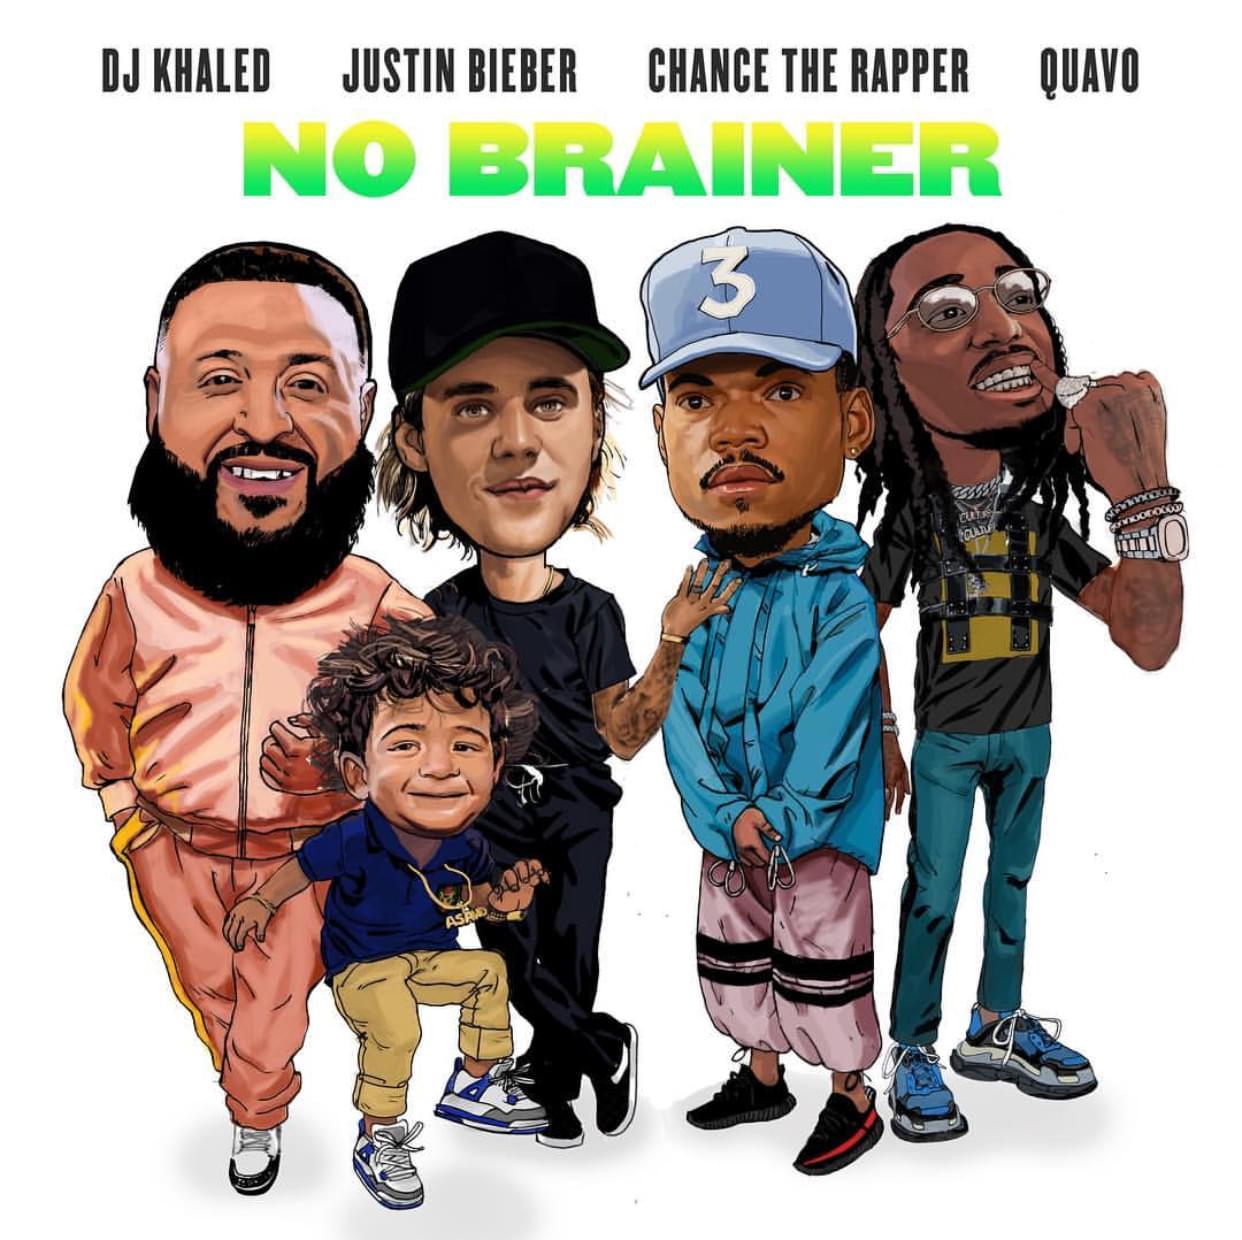 DJ Khaled, Justin Bieber, Chance the Rapper & Quavo Reunite 'No Brainer' (WATCH)